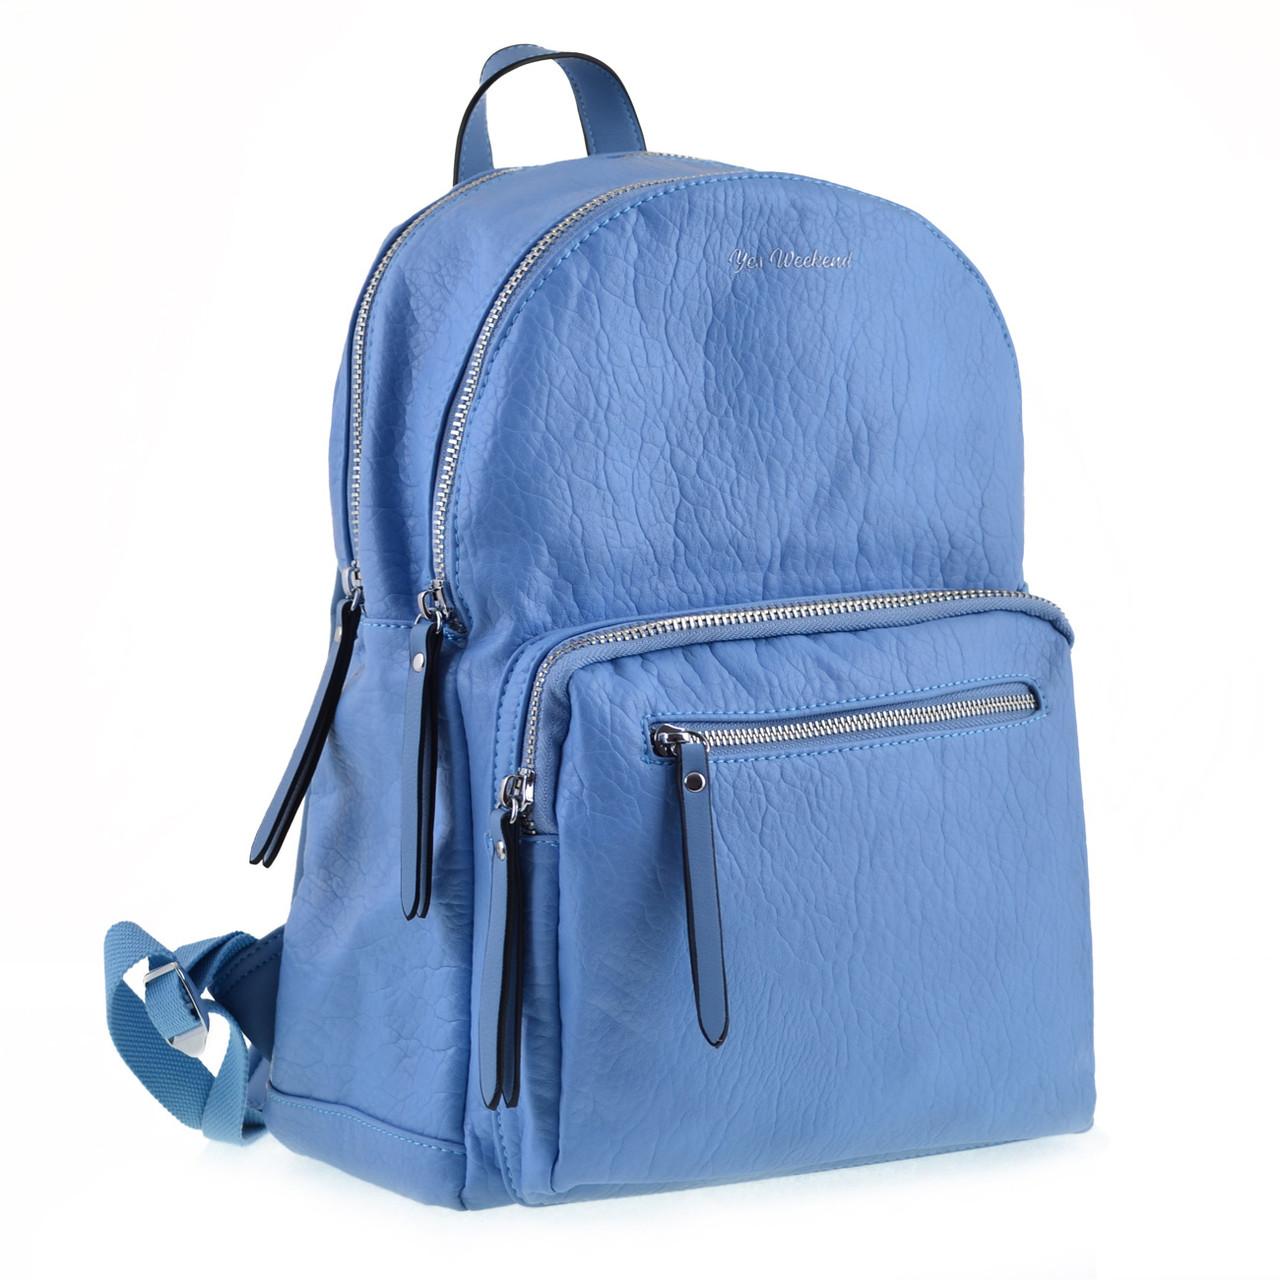 Рюкзак женский YES YW-42 «Adagio» голубой